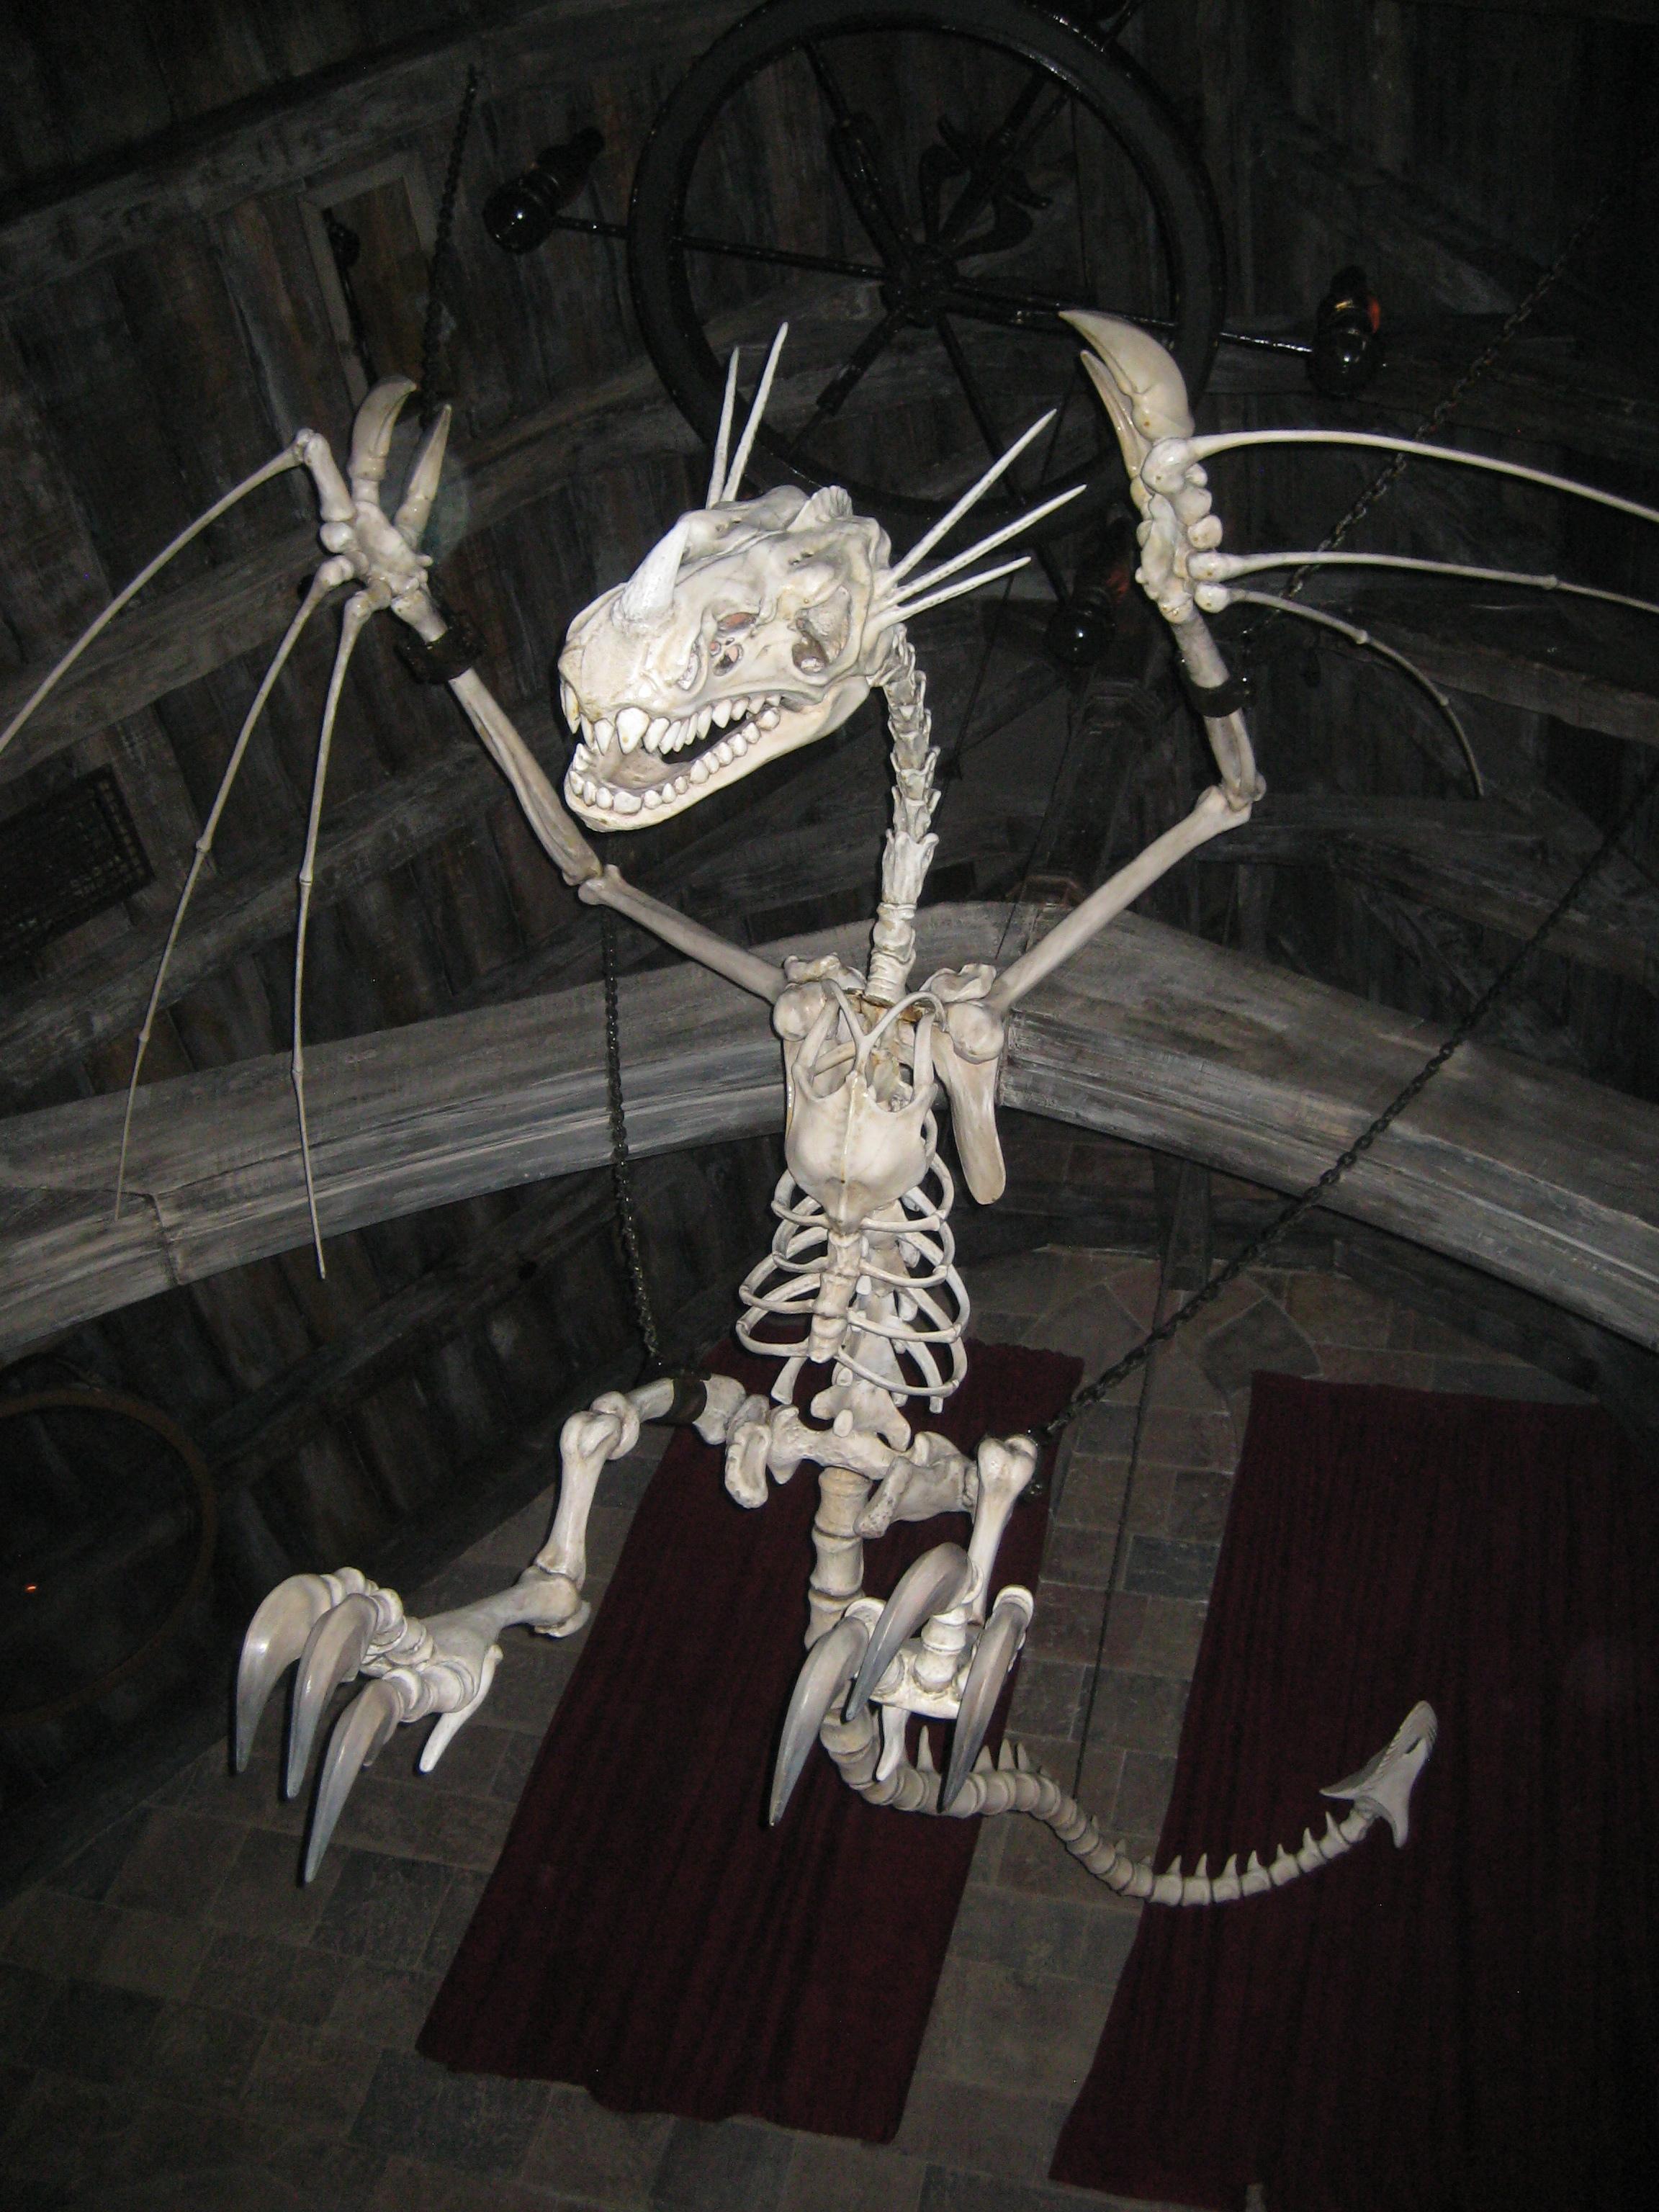 Bones of a Thestral